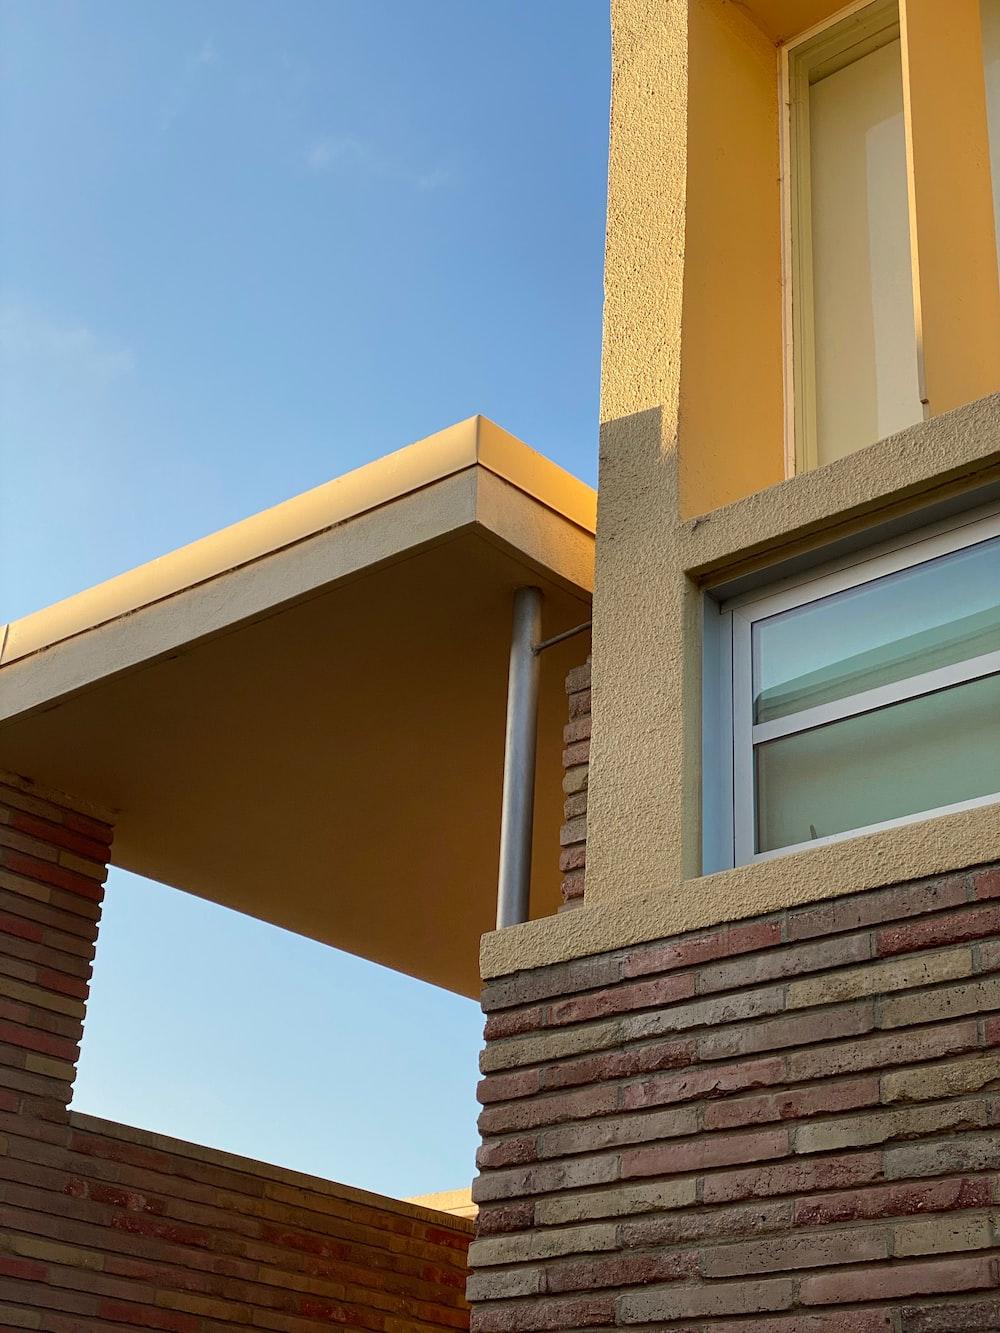 brown brick building under blue sky during daytime